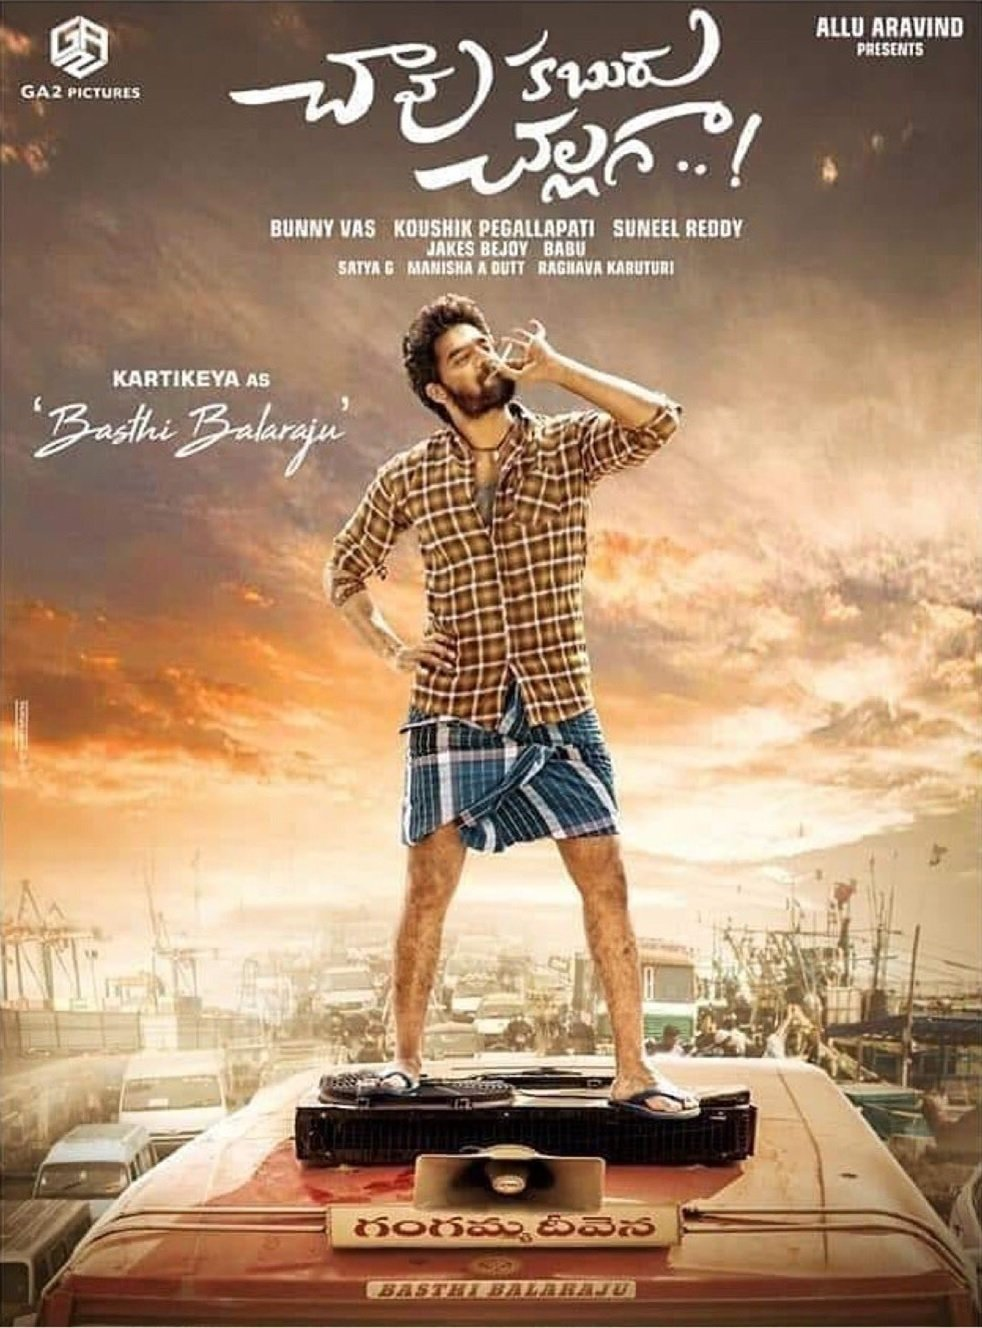 Kartikeya First Look From Chaavu Kaburu Challaga!-Kartikeya In 90 Ml Kartikeya New Movie Rx 100 Hero Stills Rx Payal Rajput